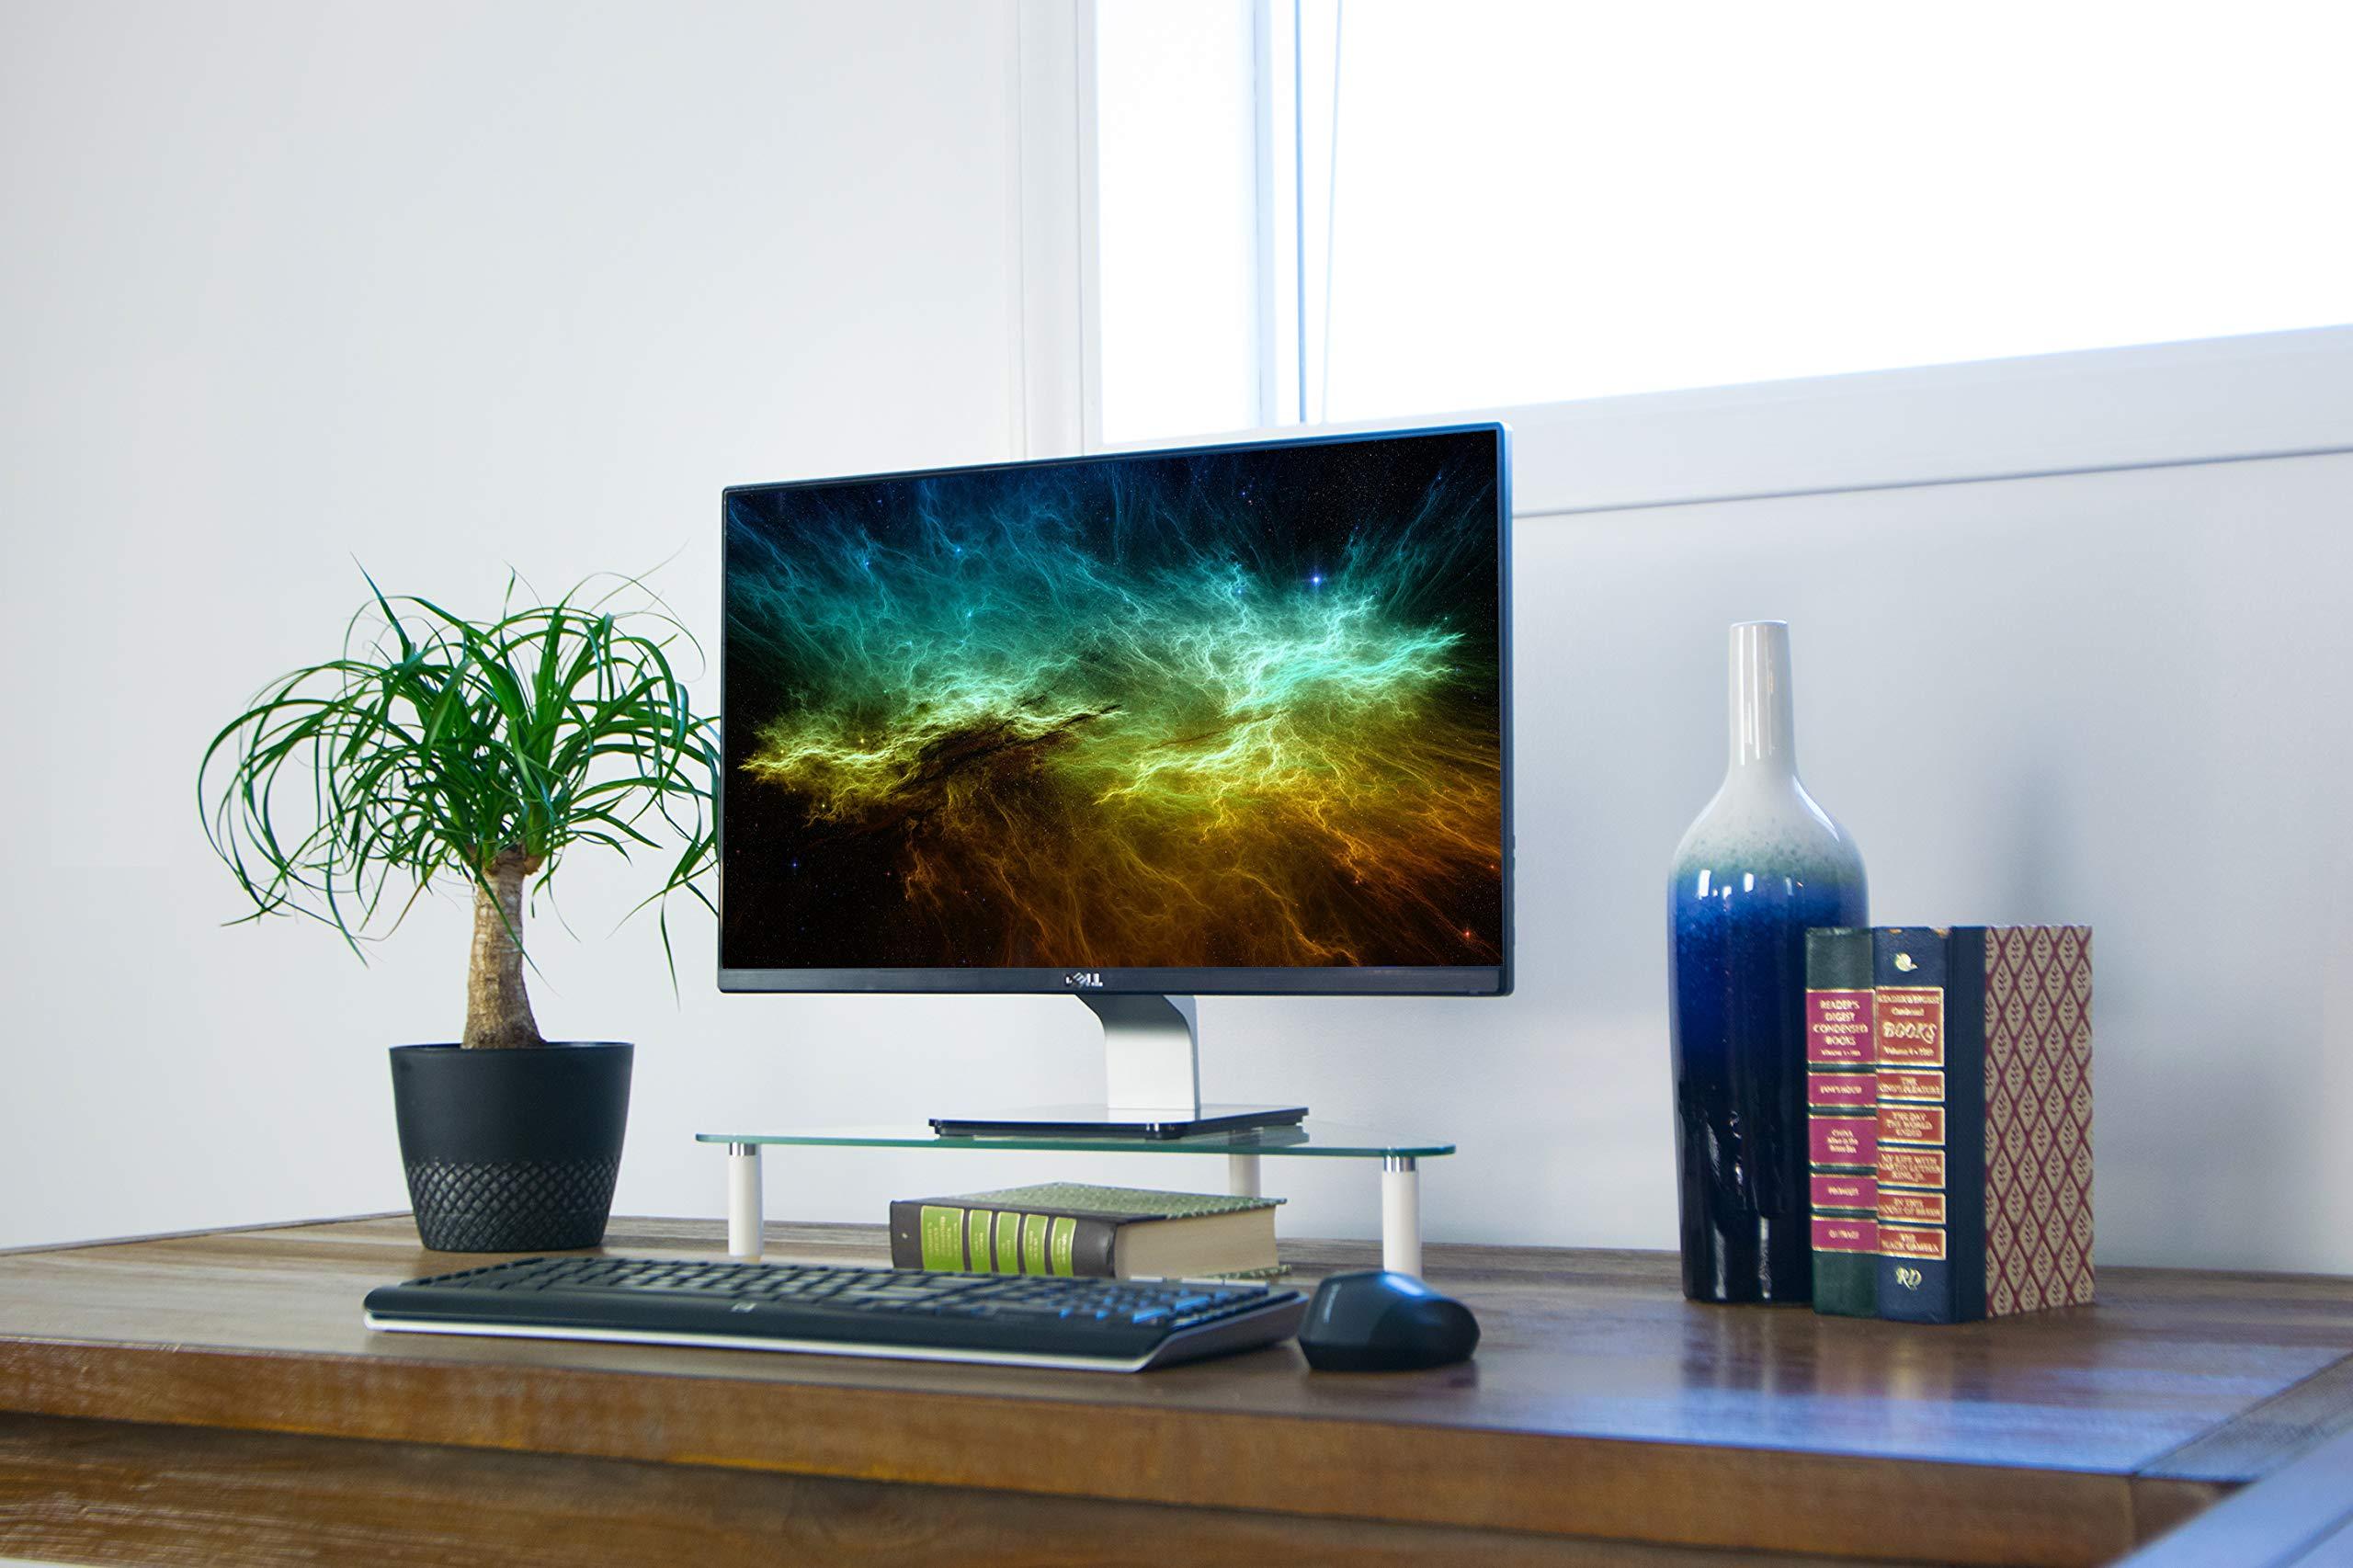 VIVO Glass Ergonomic Tabletop Riser | Triangle Desktop Universal Corner Stand for Computer Monitor & Laptop (STAND-V000Q) by VIVO (Image #4)